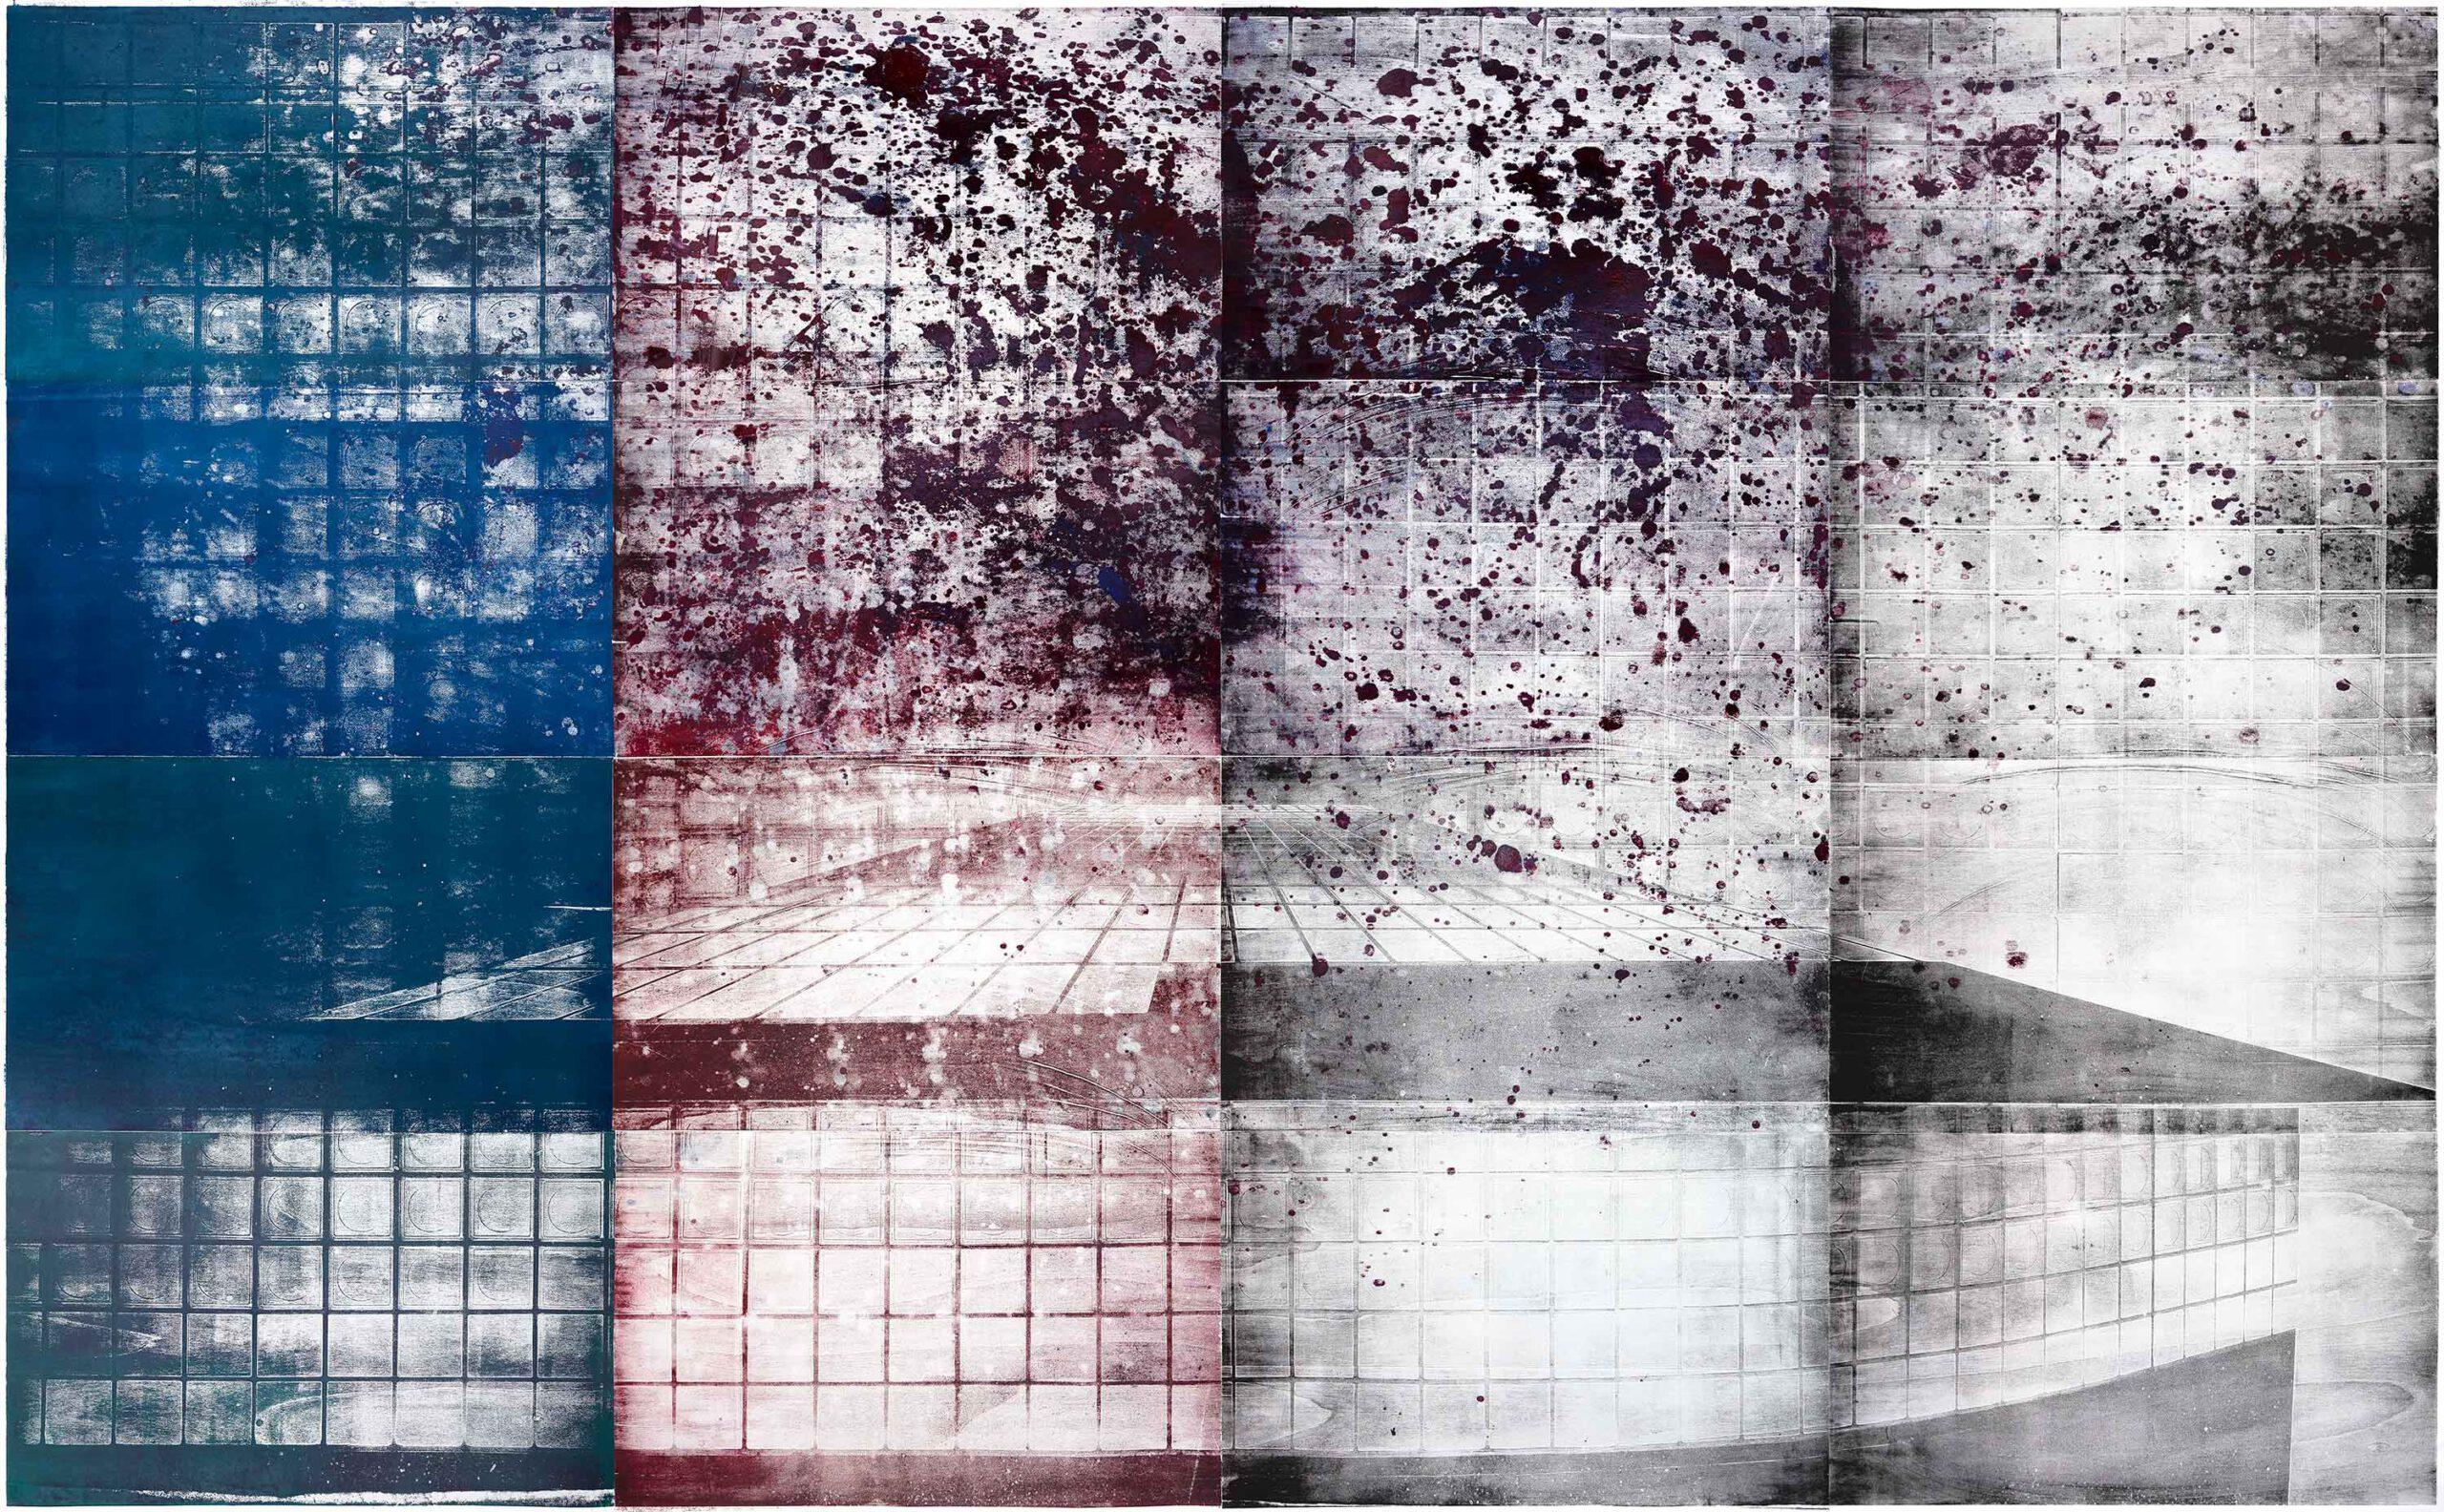 Unendlichkeitswand 2 (pool laroc), 2020, wood engraving, 251 x 391,9cm